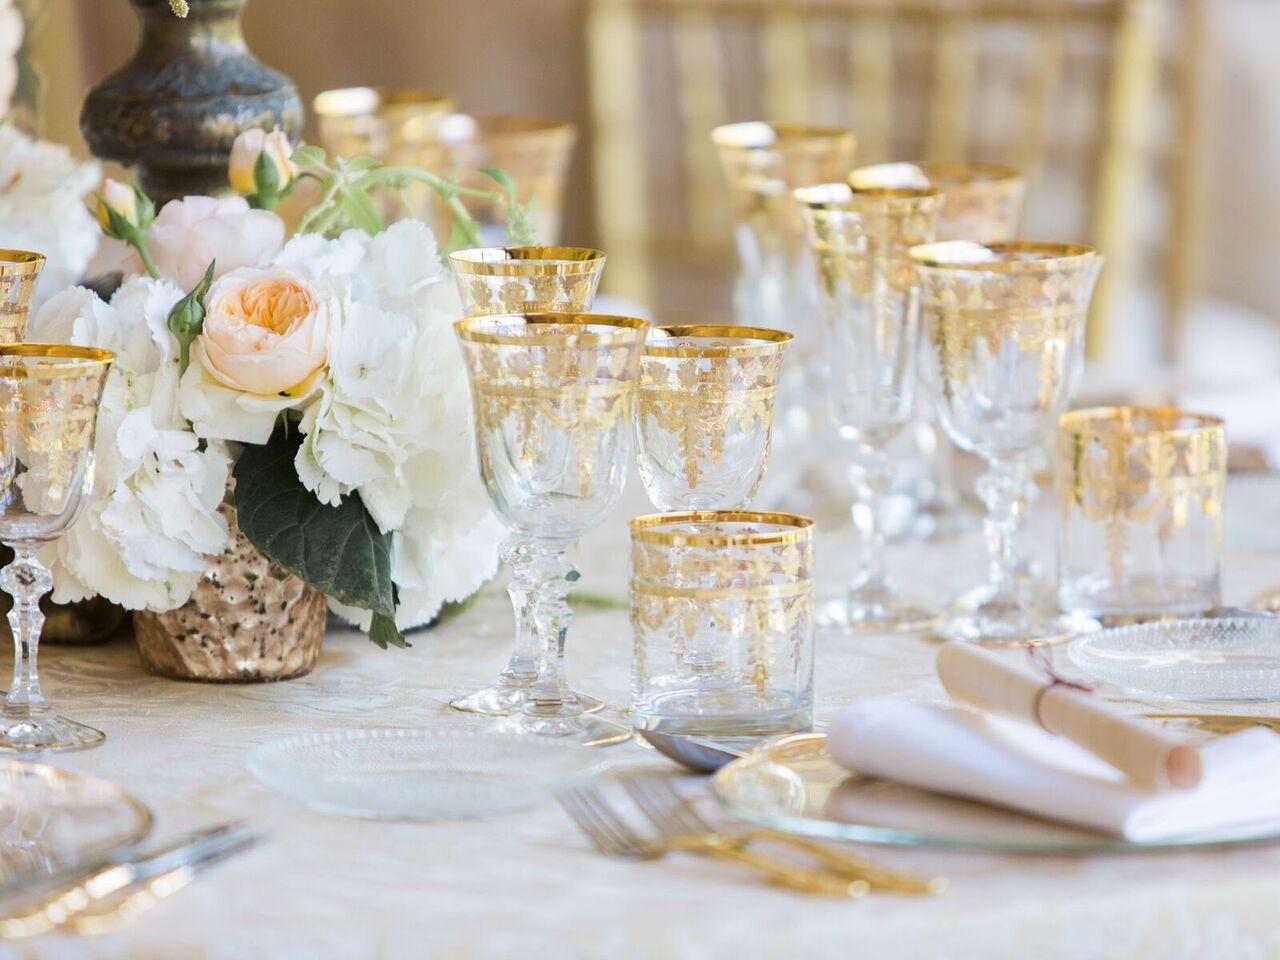 Si-Quiero-Wedding-Planner-By-Sira-Antequera-Paola-Pedro-17